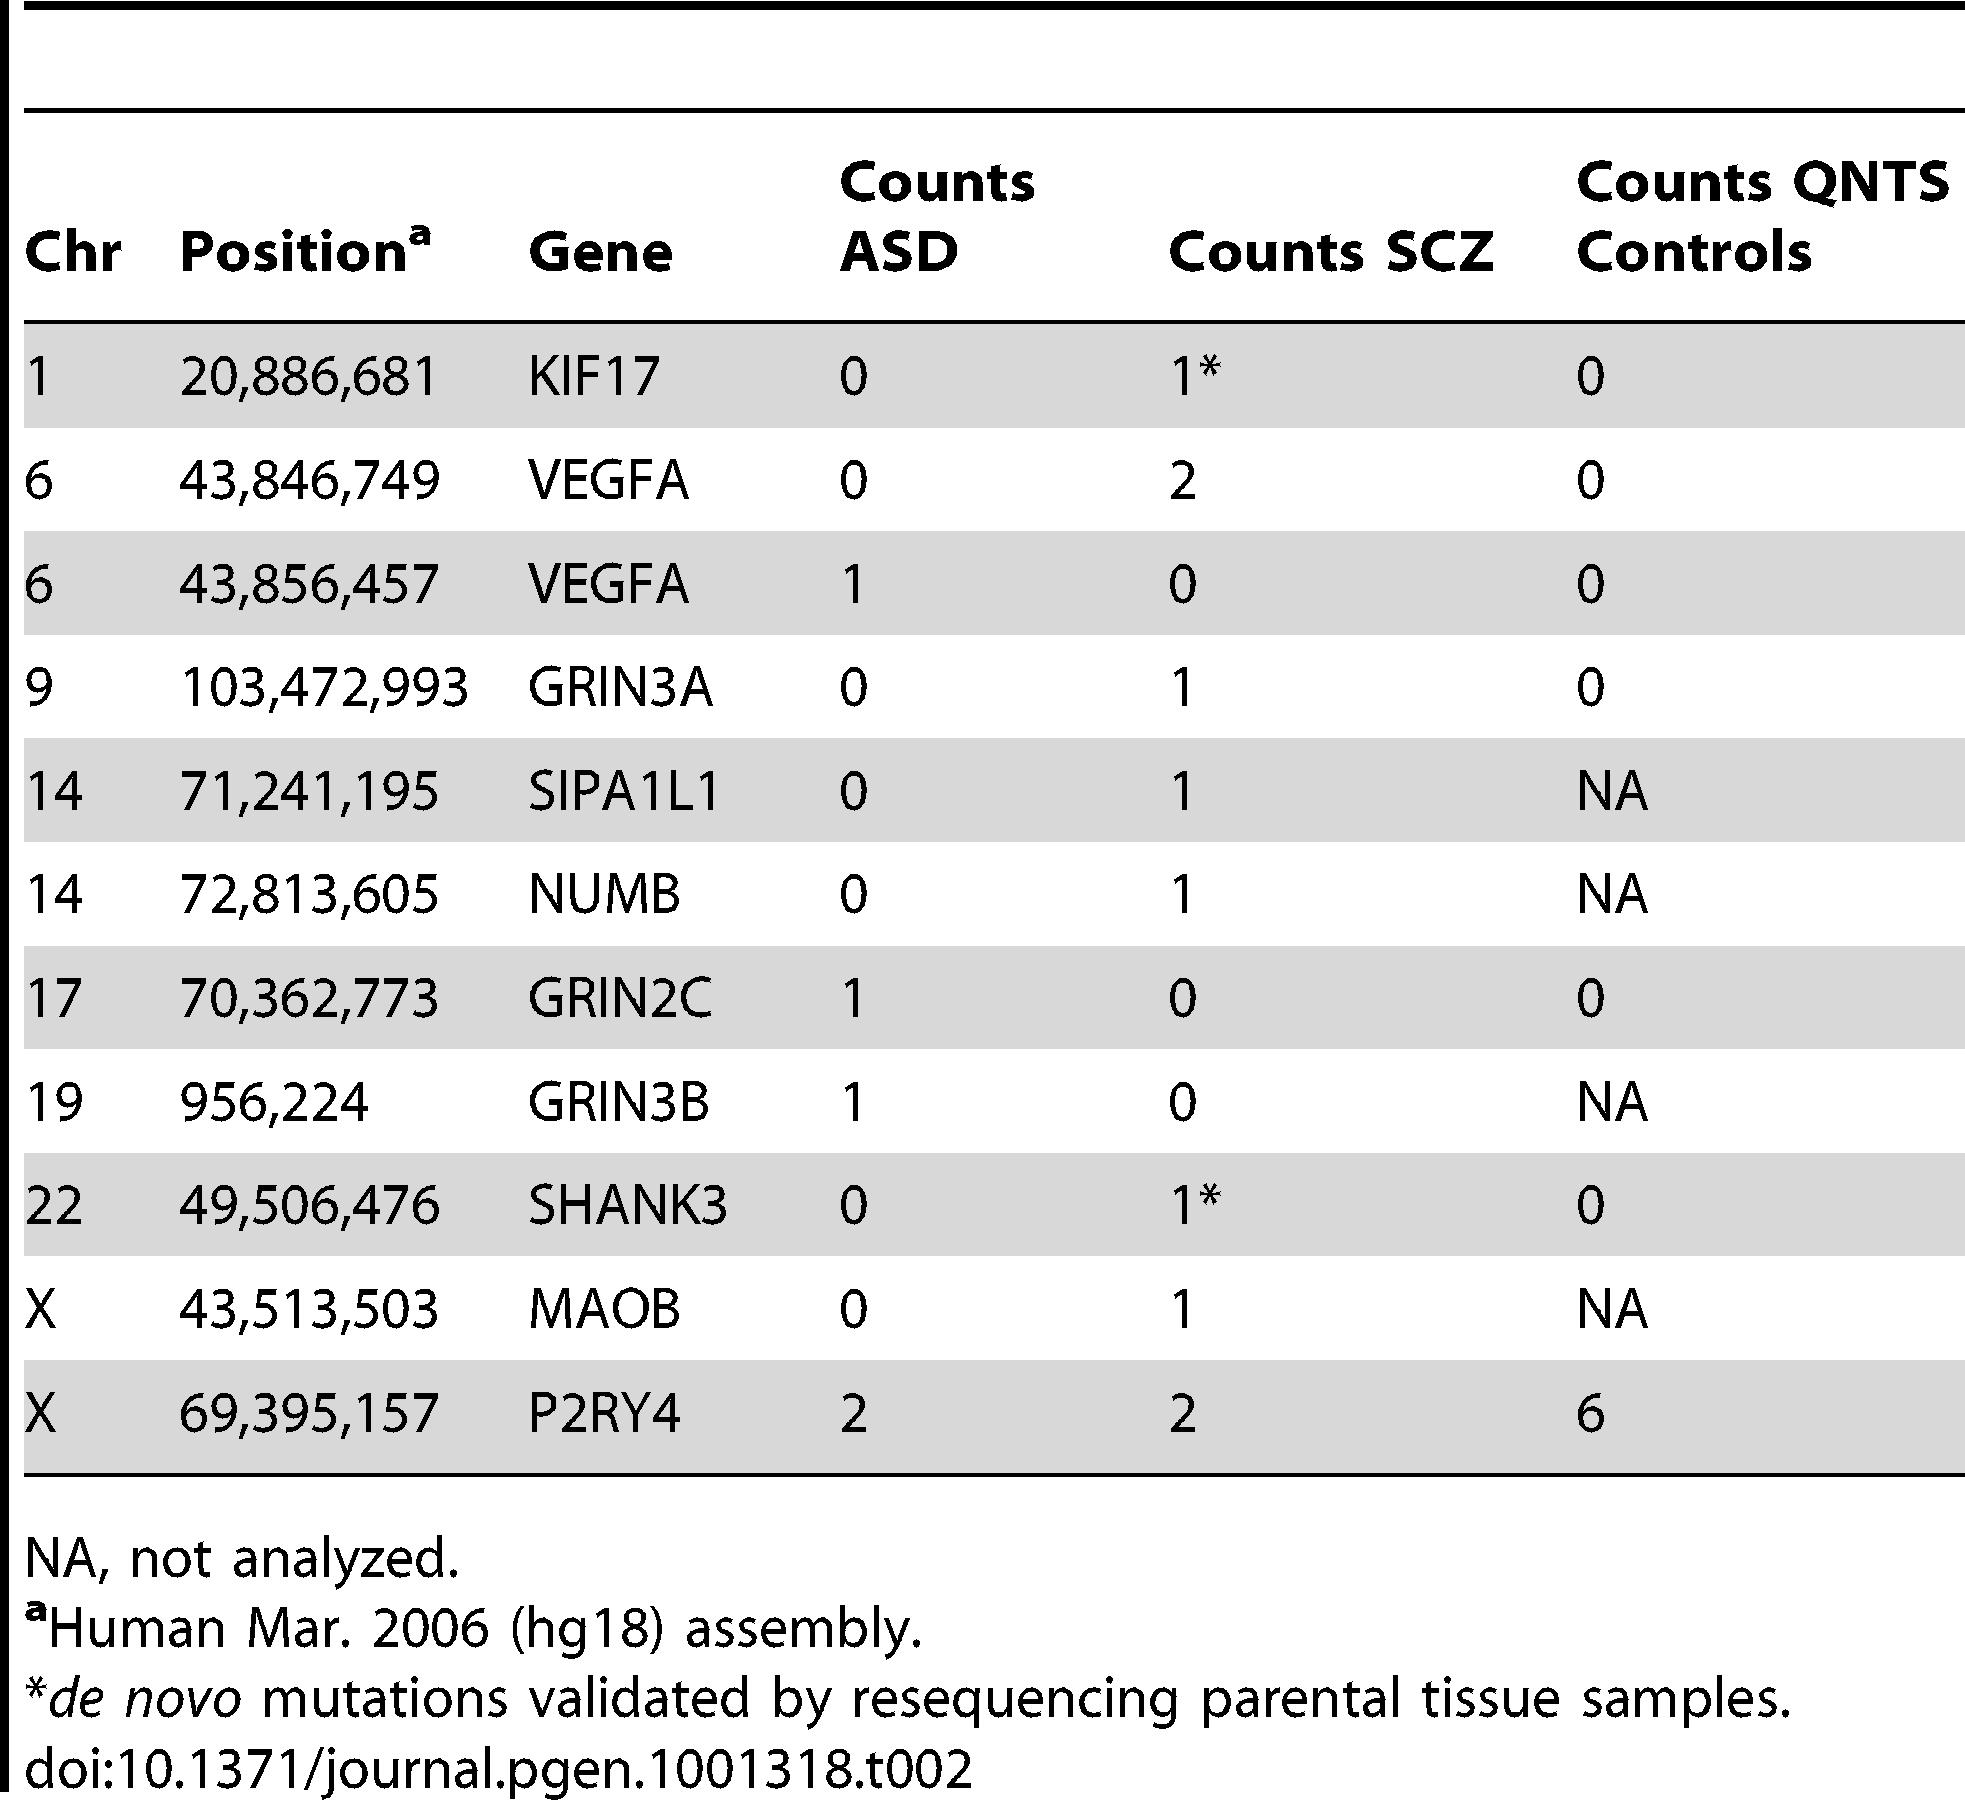 Nonsense Mutations in Disease Cohorts.